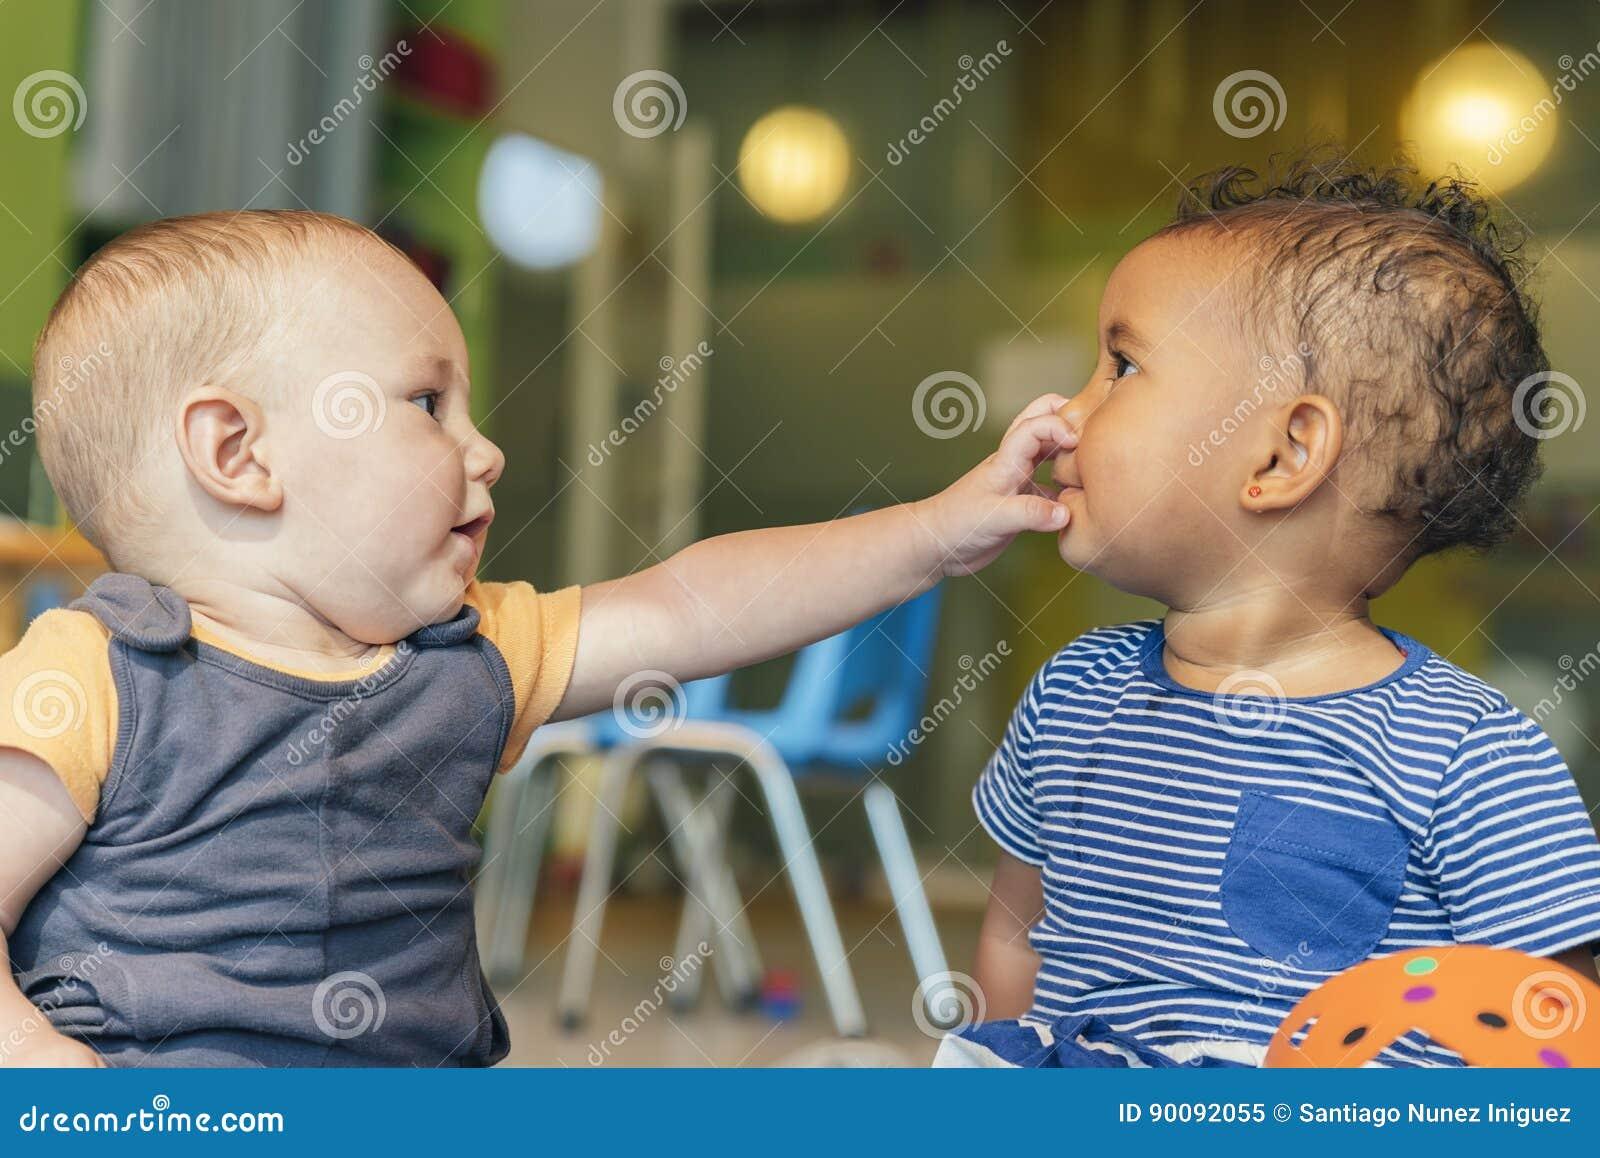 Babys che gioca insieme